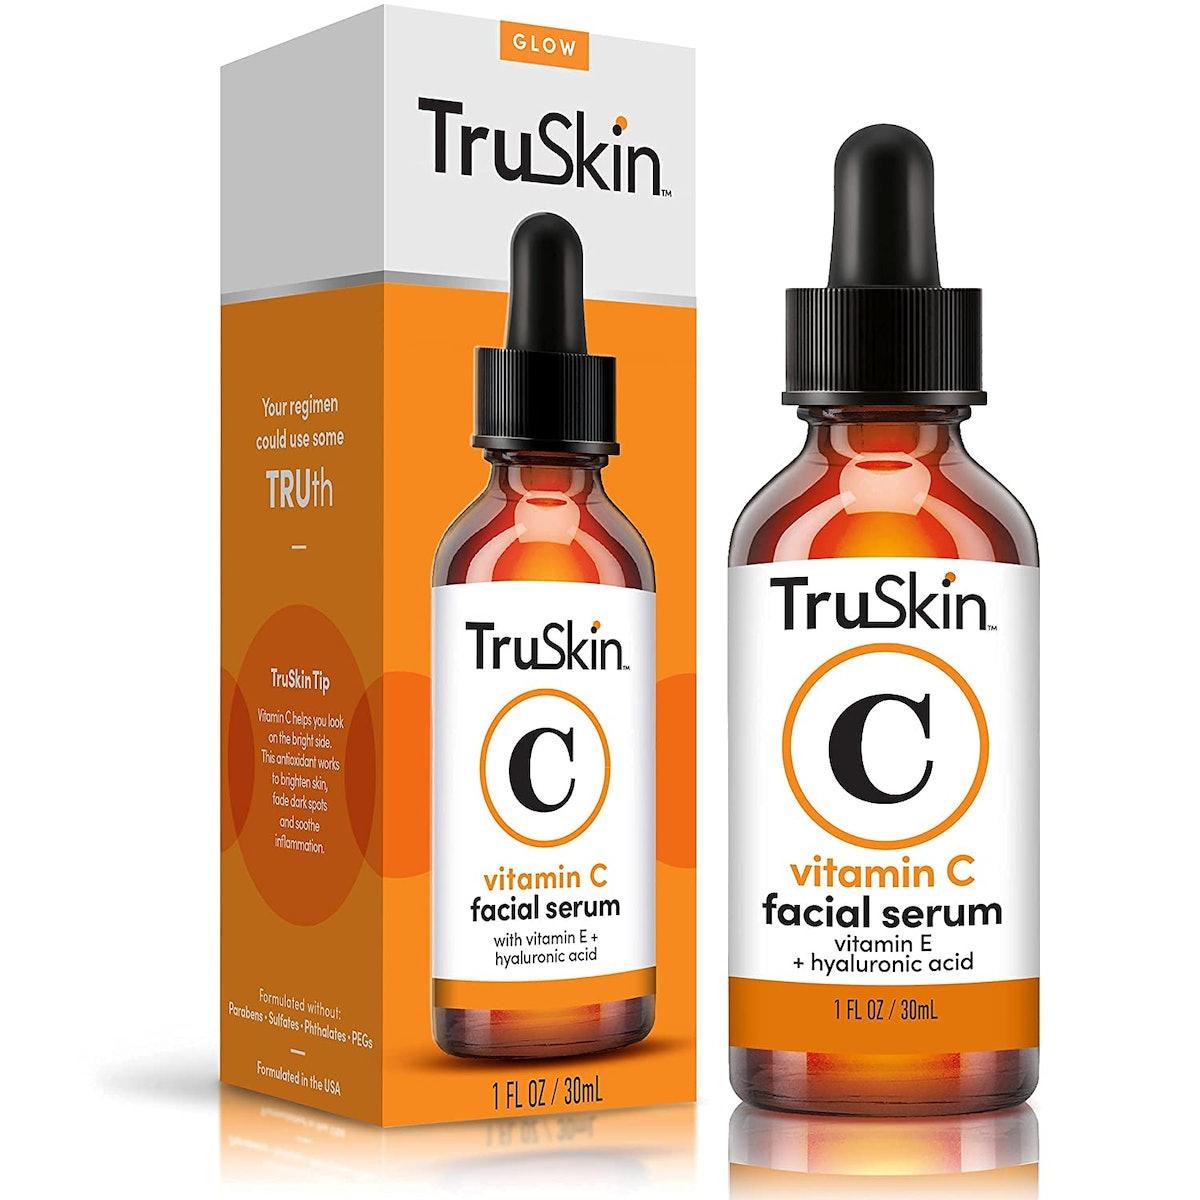 TruSkin Vitamin C Serum with Hyaluronic Acid & Vitamin E